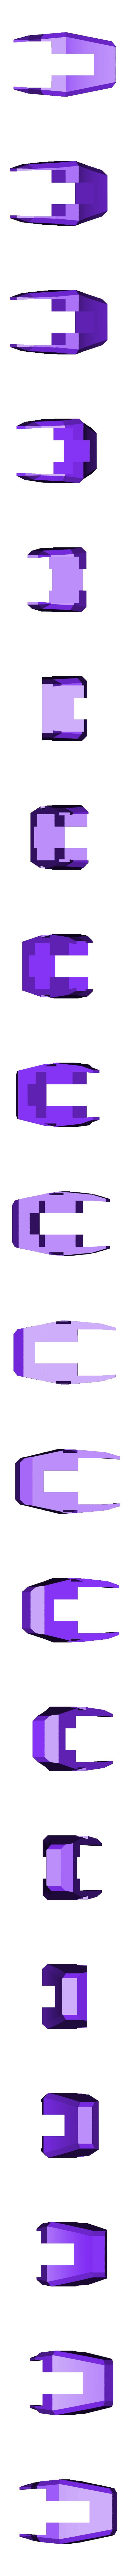 LegT2_Left_Foot_14_OliveGreen.stl Download STL file Heavy Gun Walker • 3D print design, Jwoong